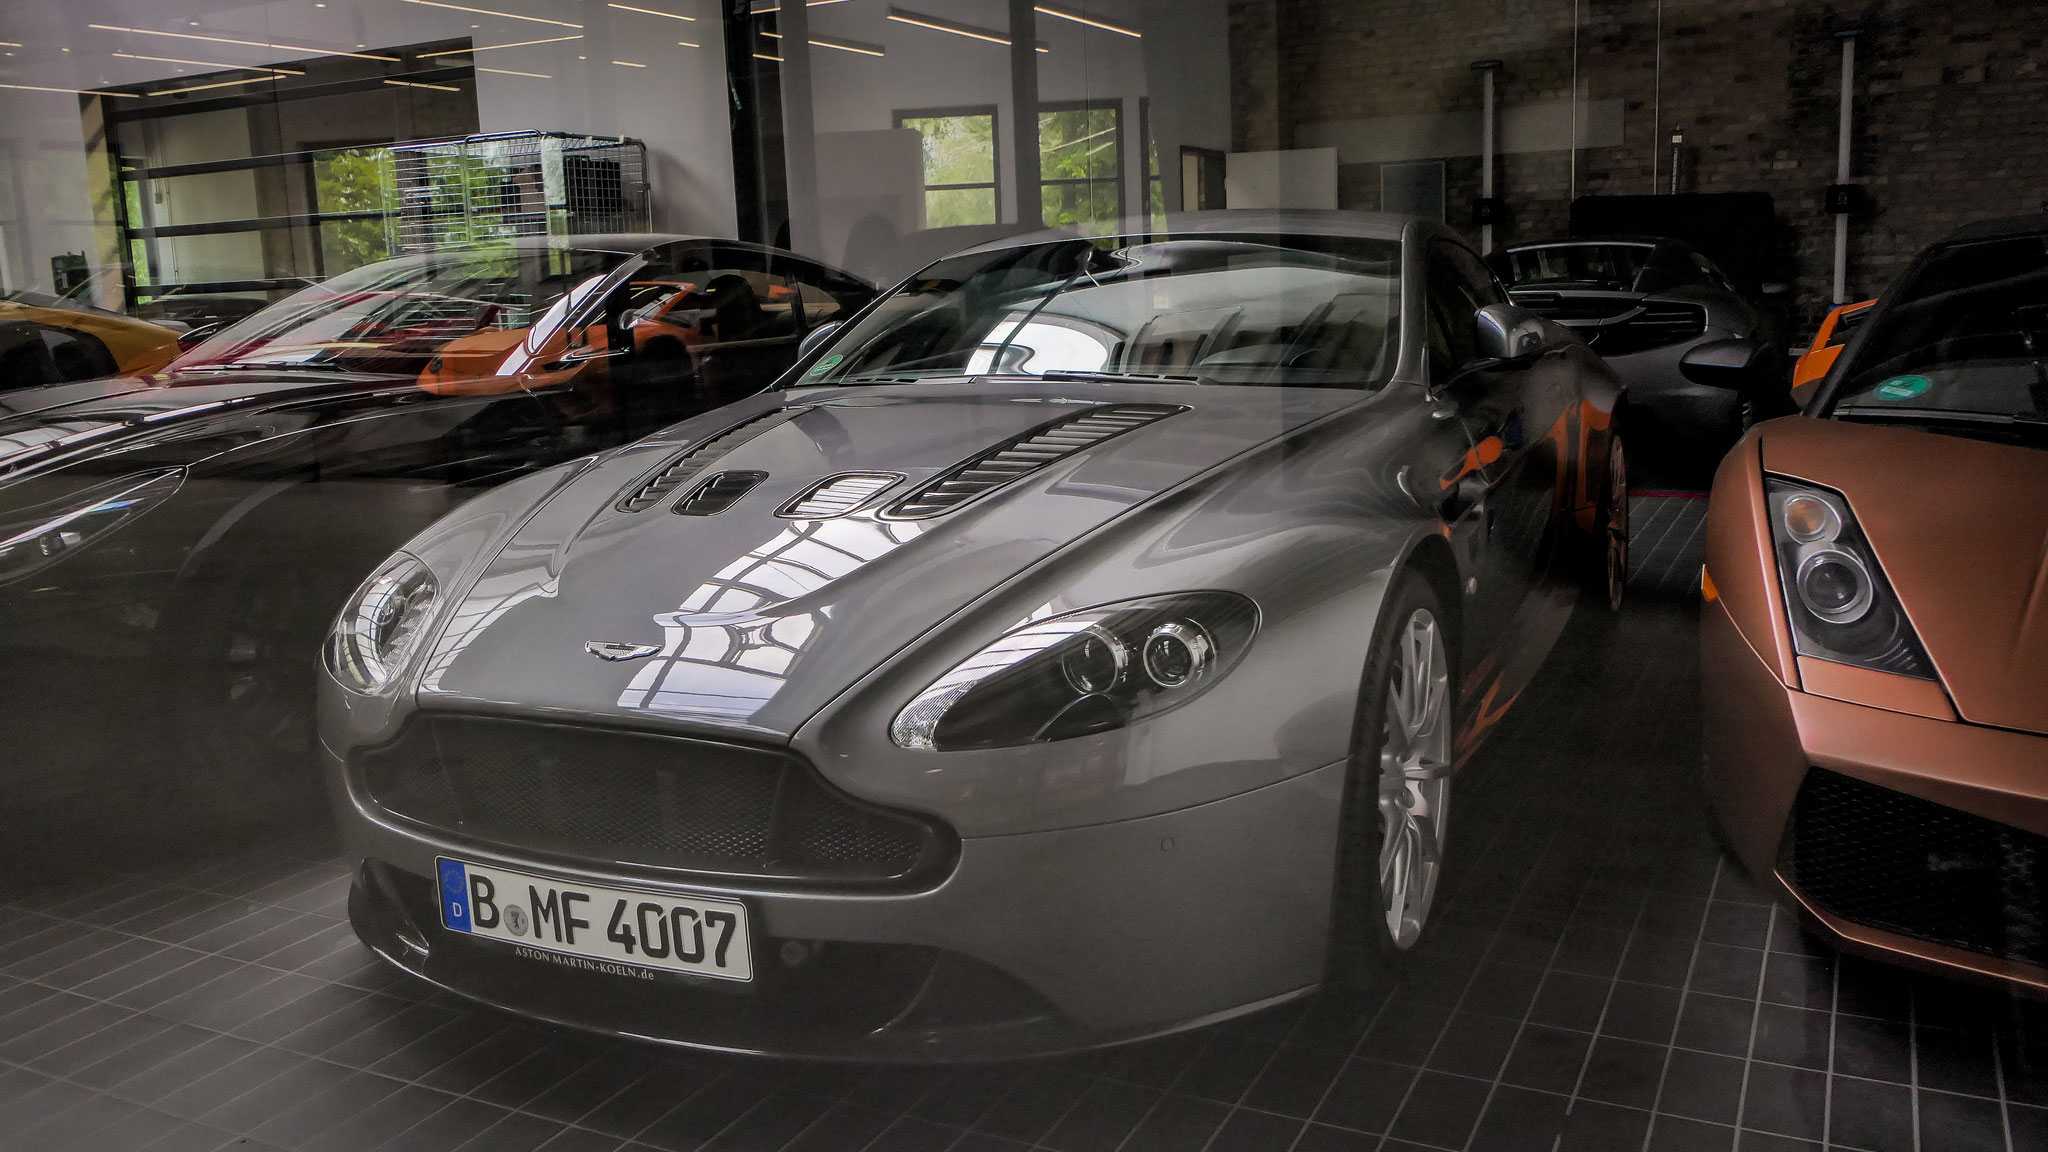 Aston Martin Vantage V12 - B-MF-4007